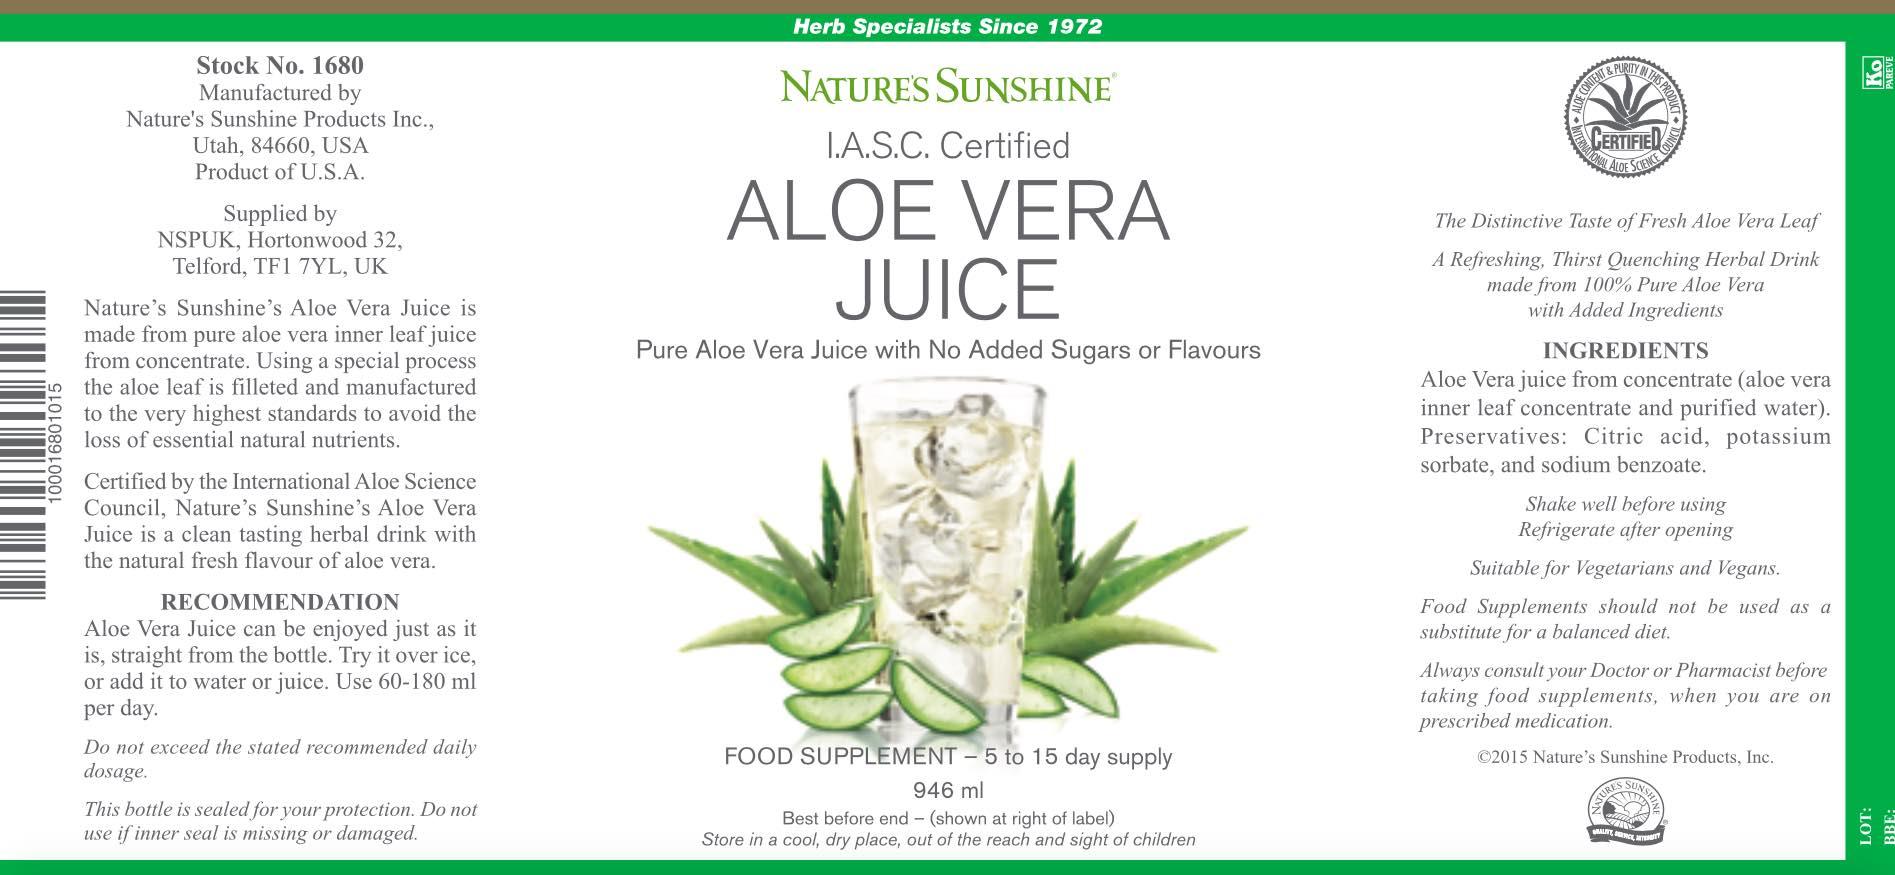 Nature's Sunshine Aloe Vera Juice (946ml) - Label